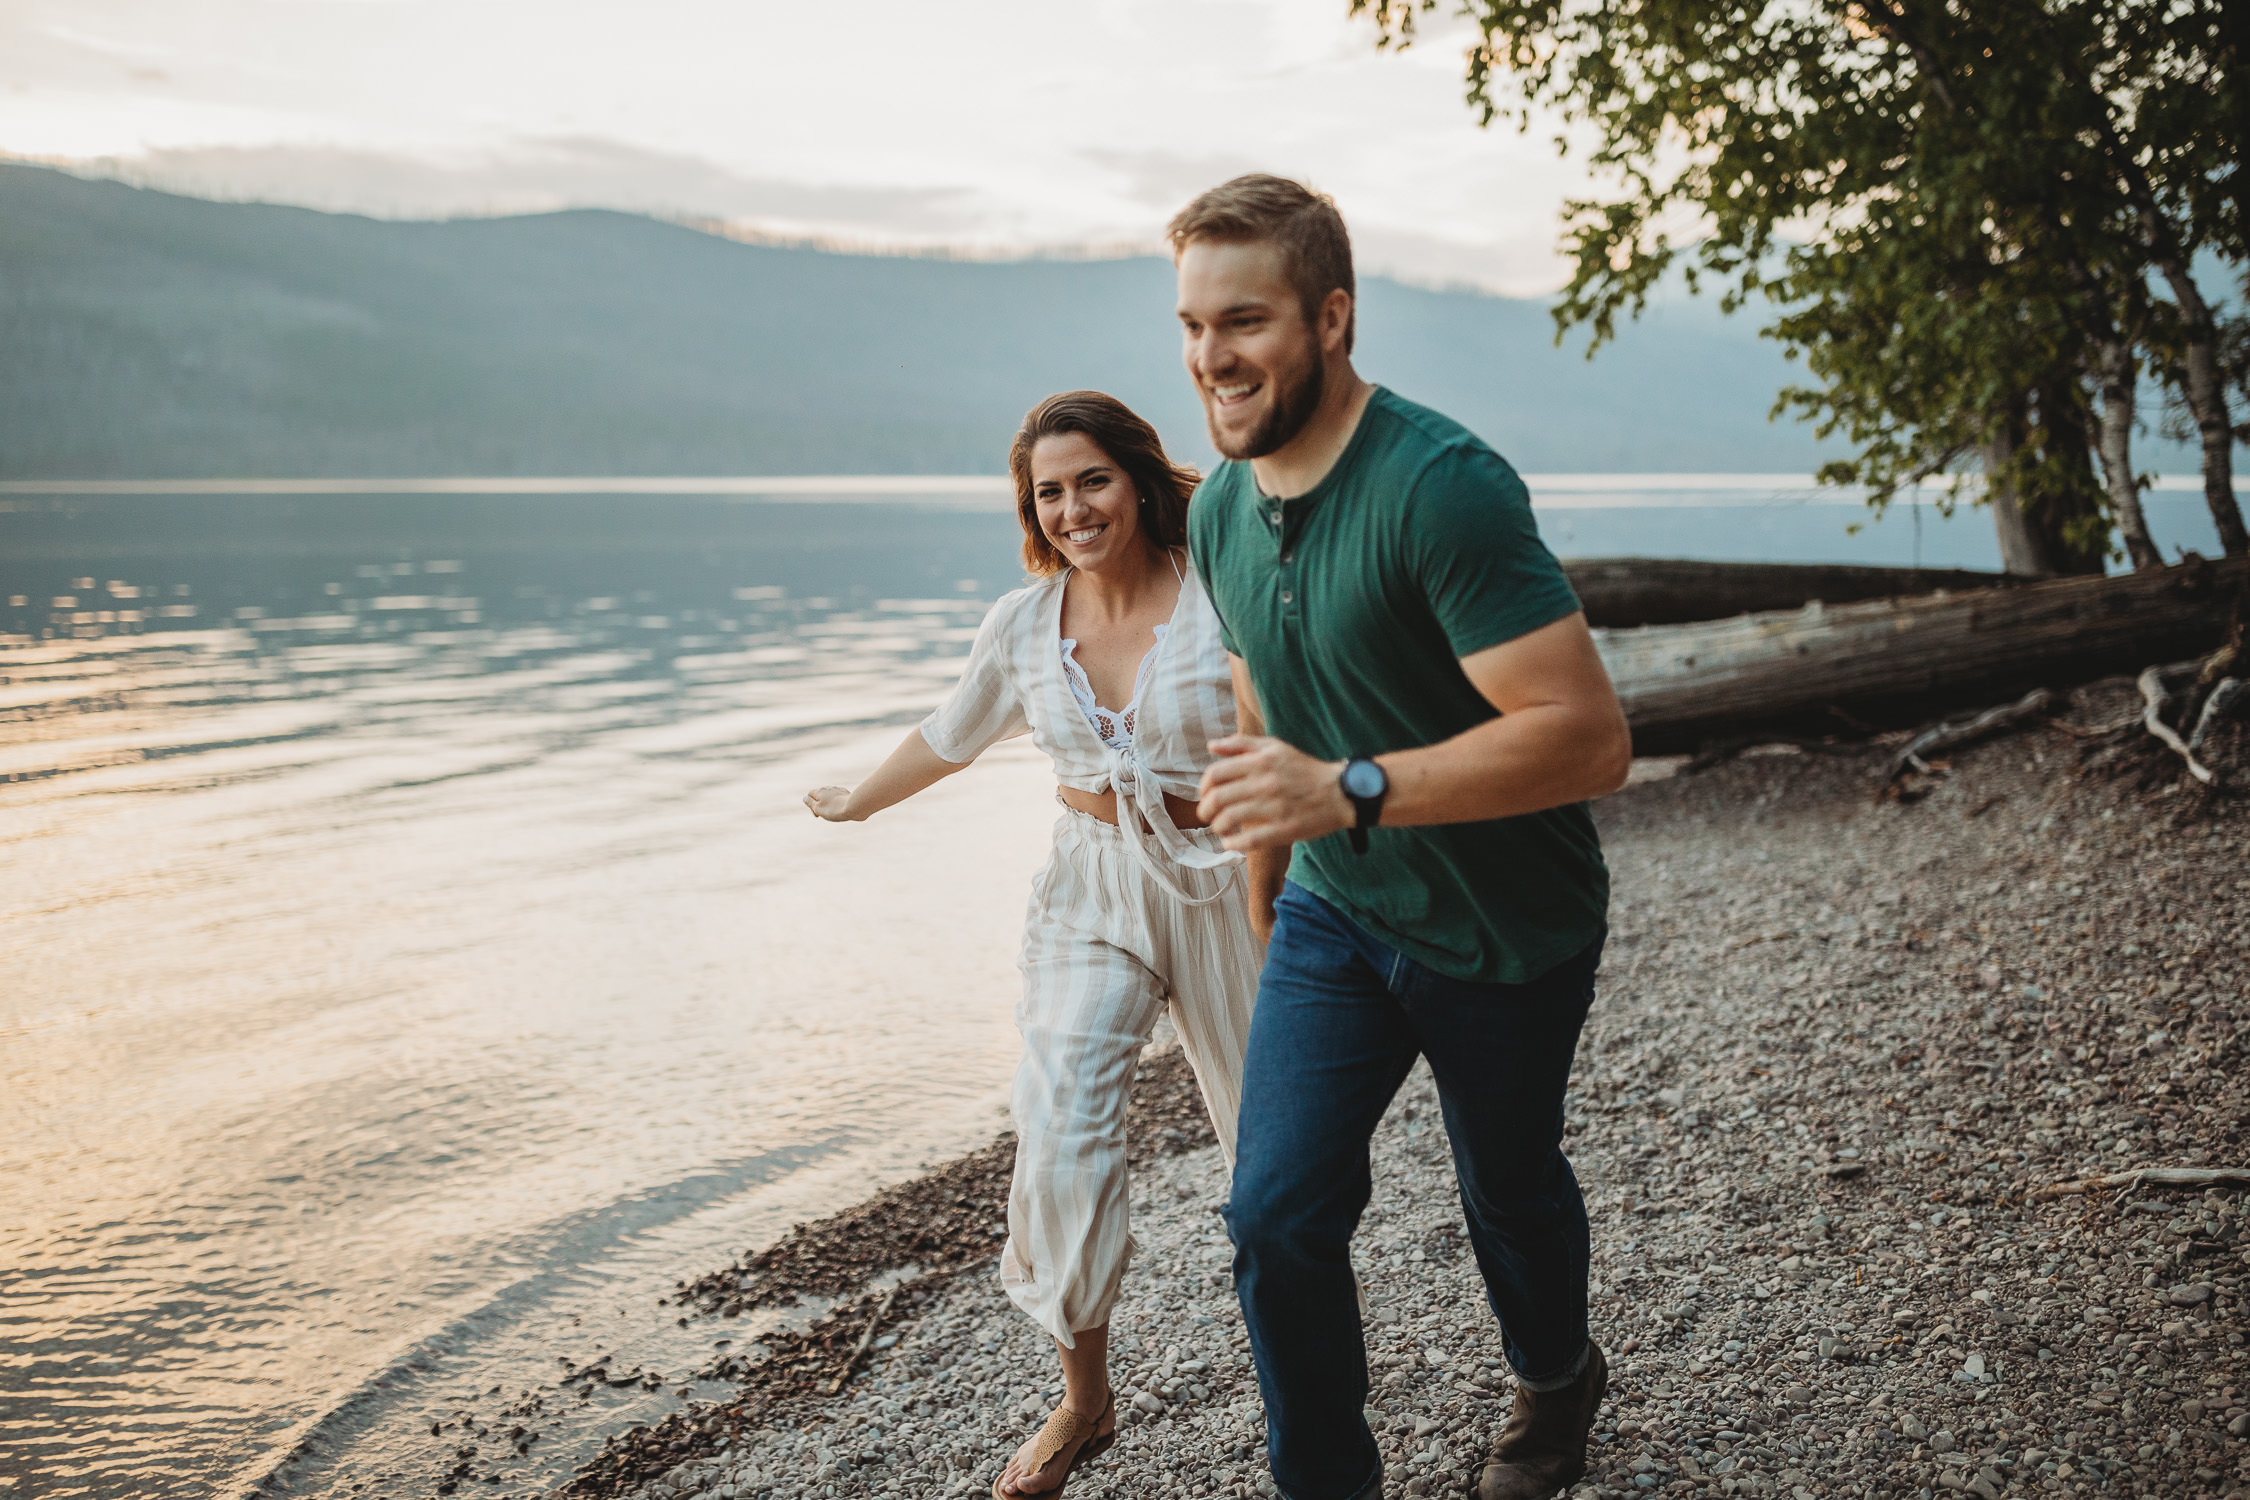 Lake-McDonald-Engagement-Photos-1.jpg